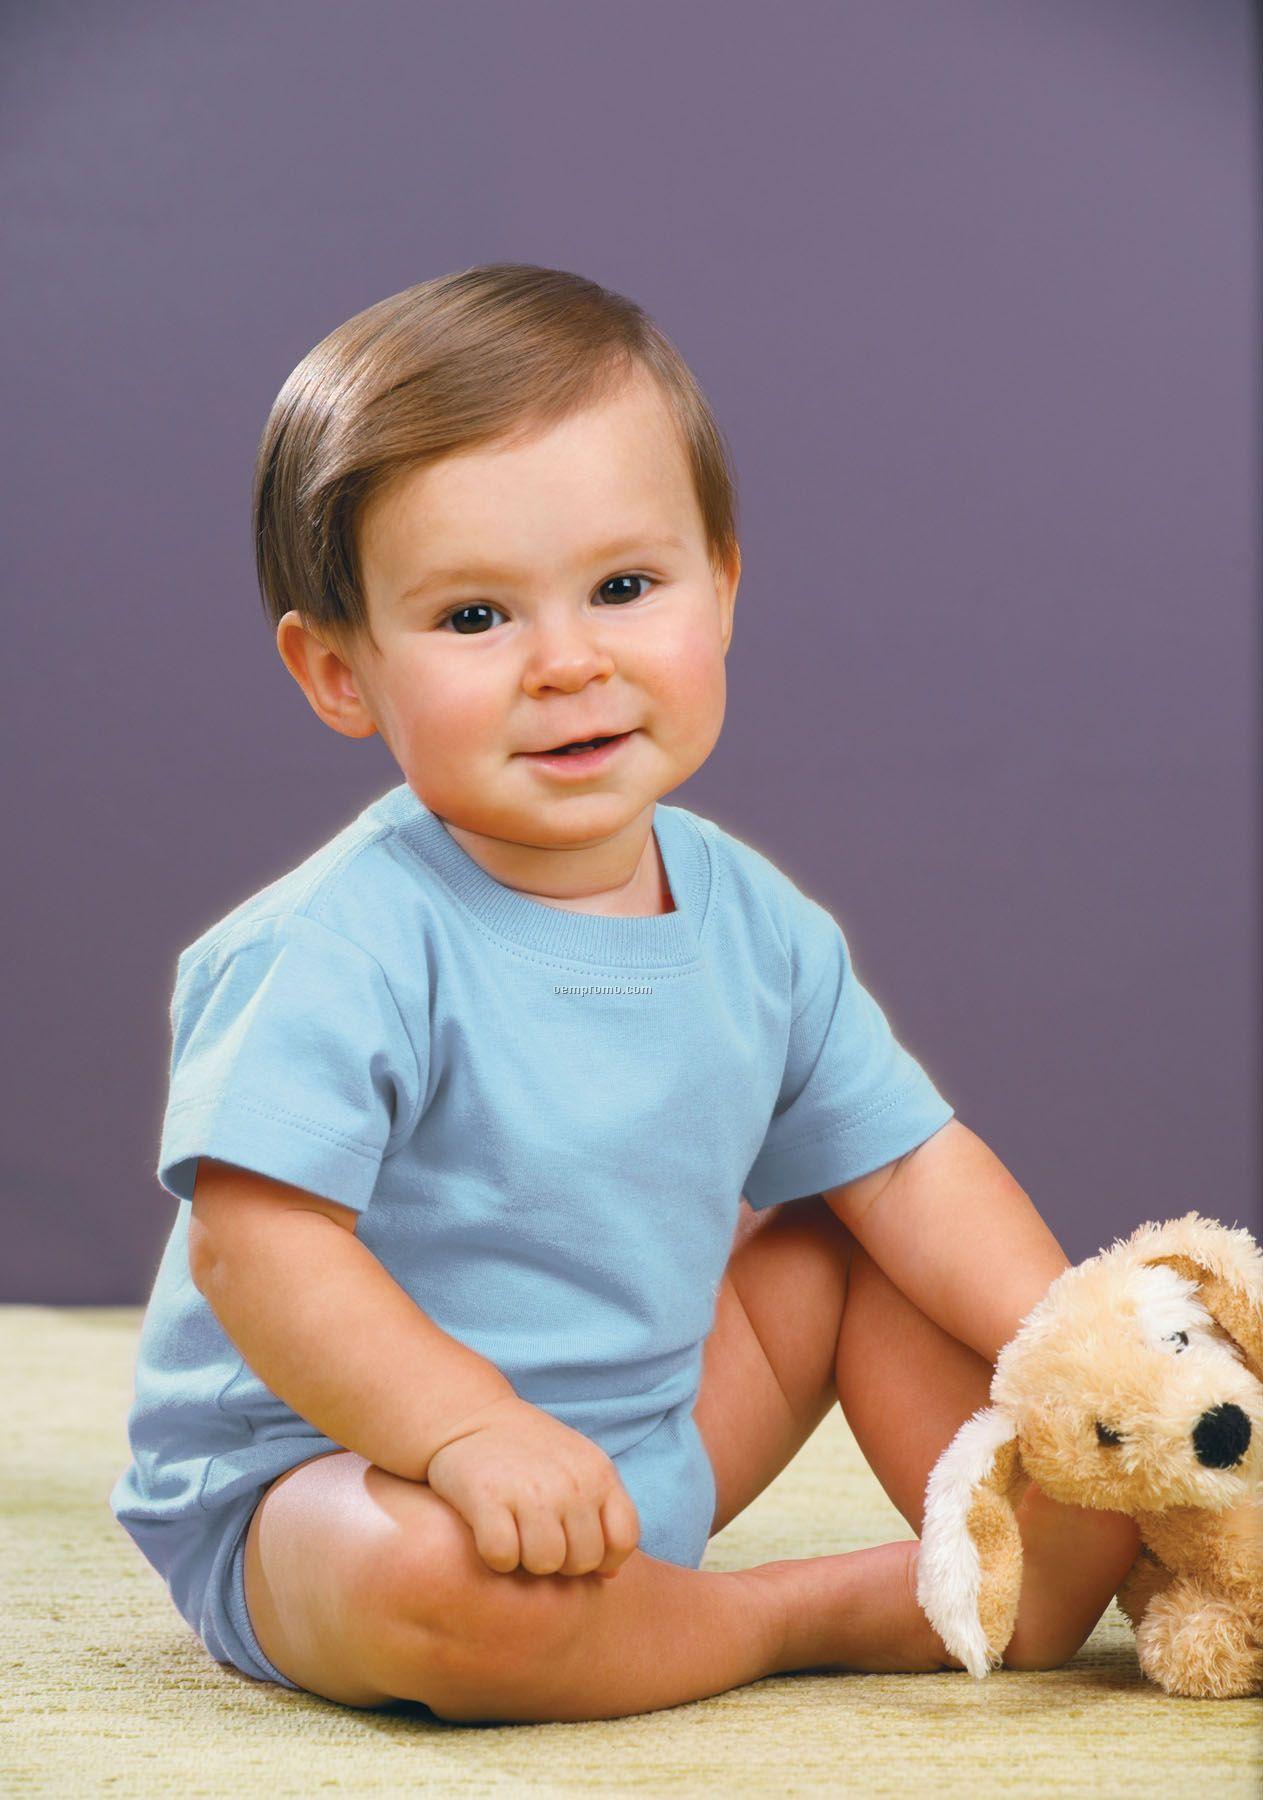 Rabbit Skins Infant Softy Creeper - White